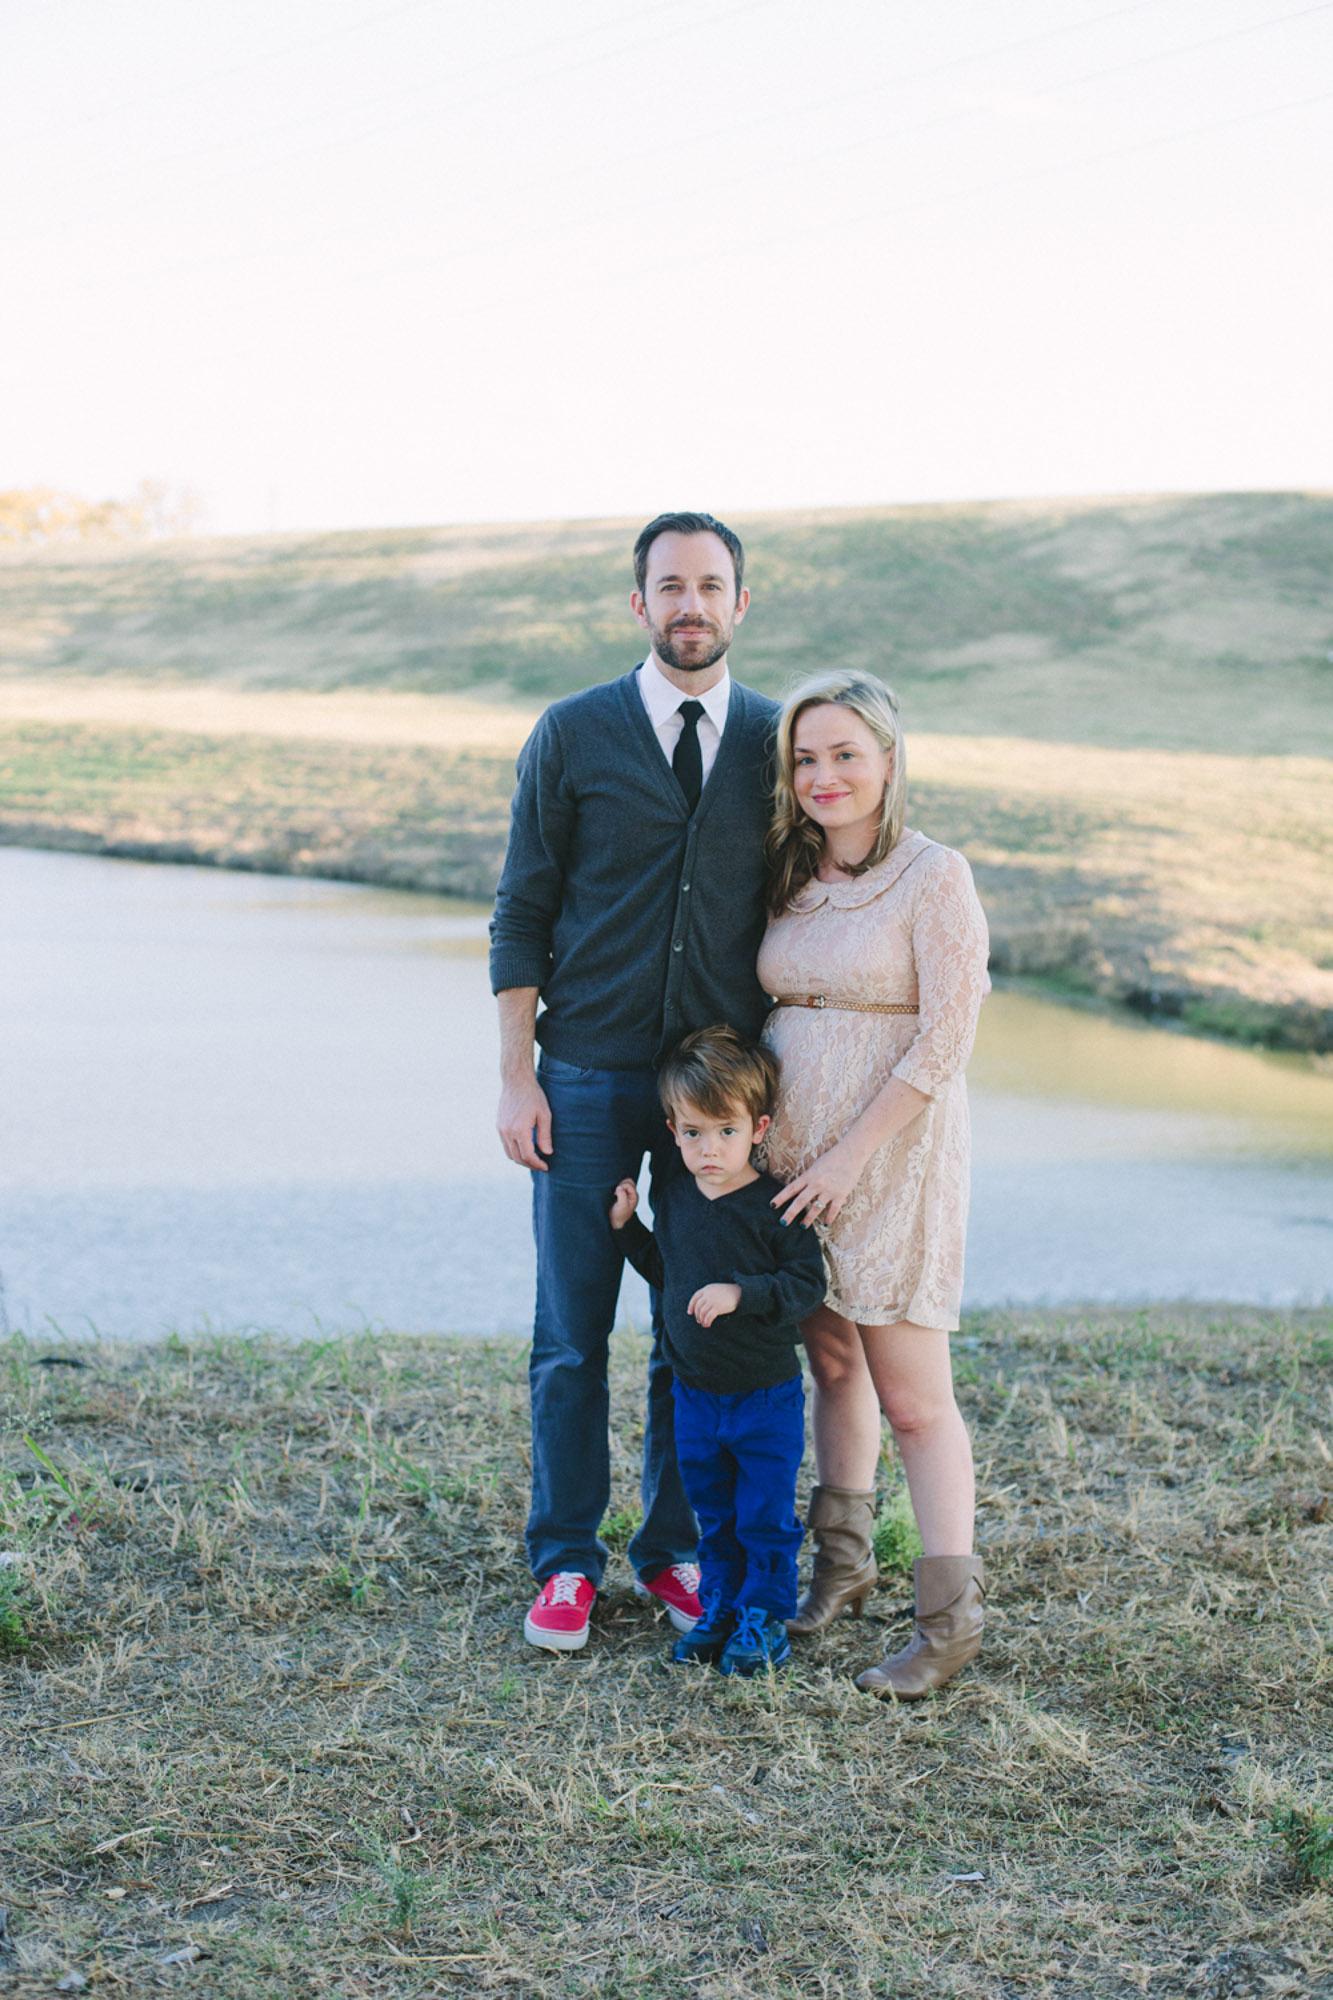 LaurenMcClure_Web_Family-47.jpg